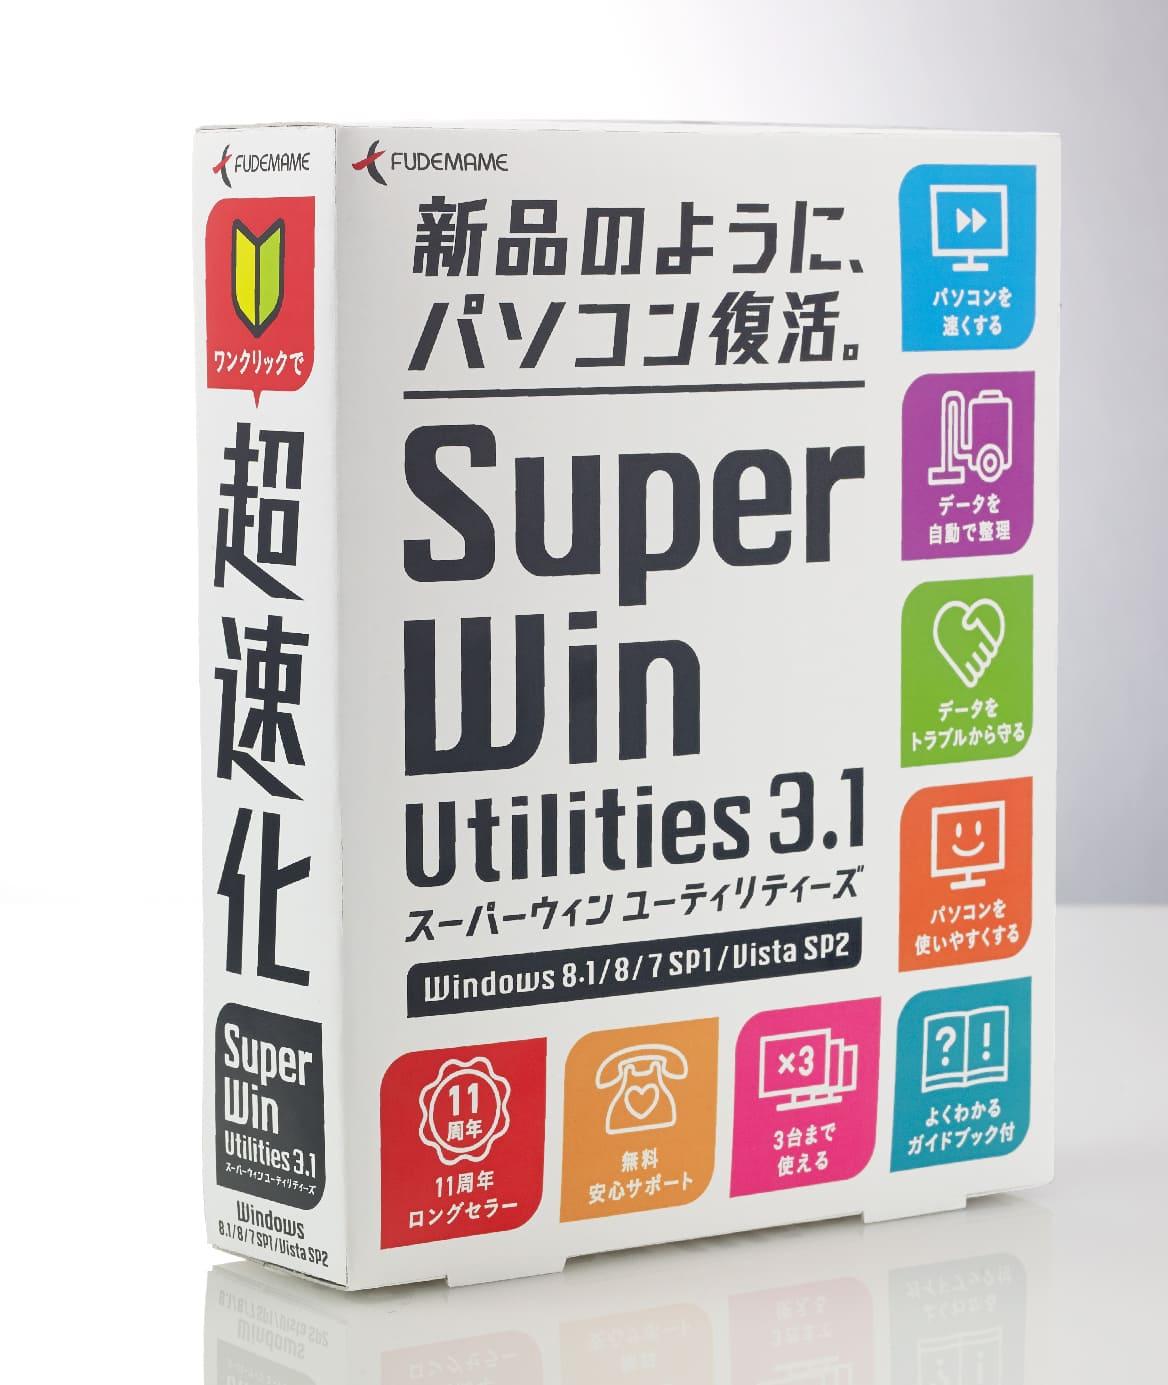 FUDEMAME-Super Winの表パッケージ